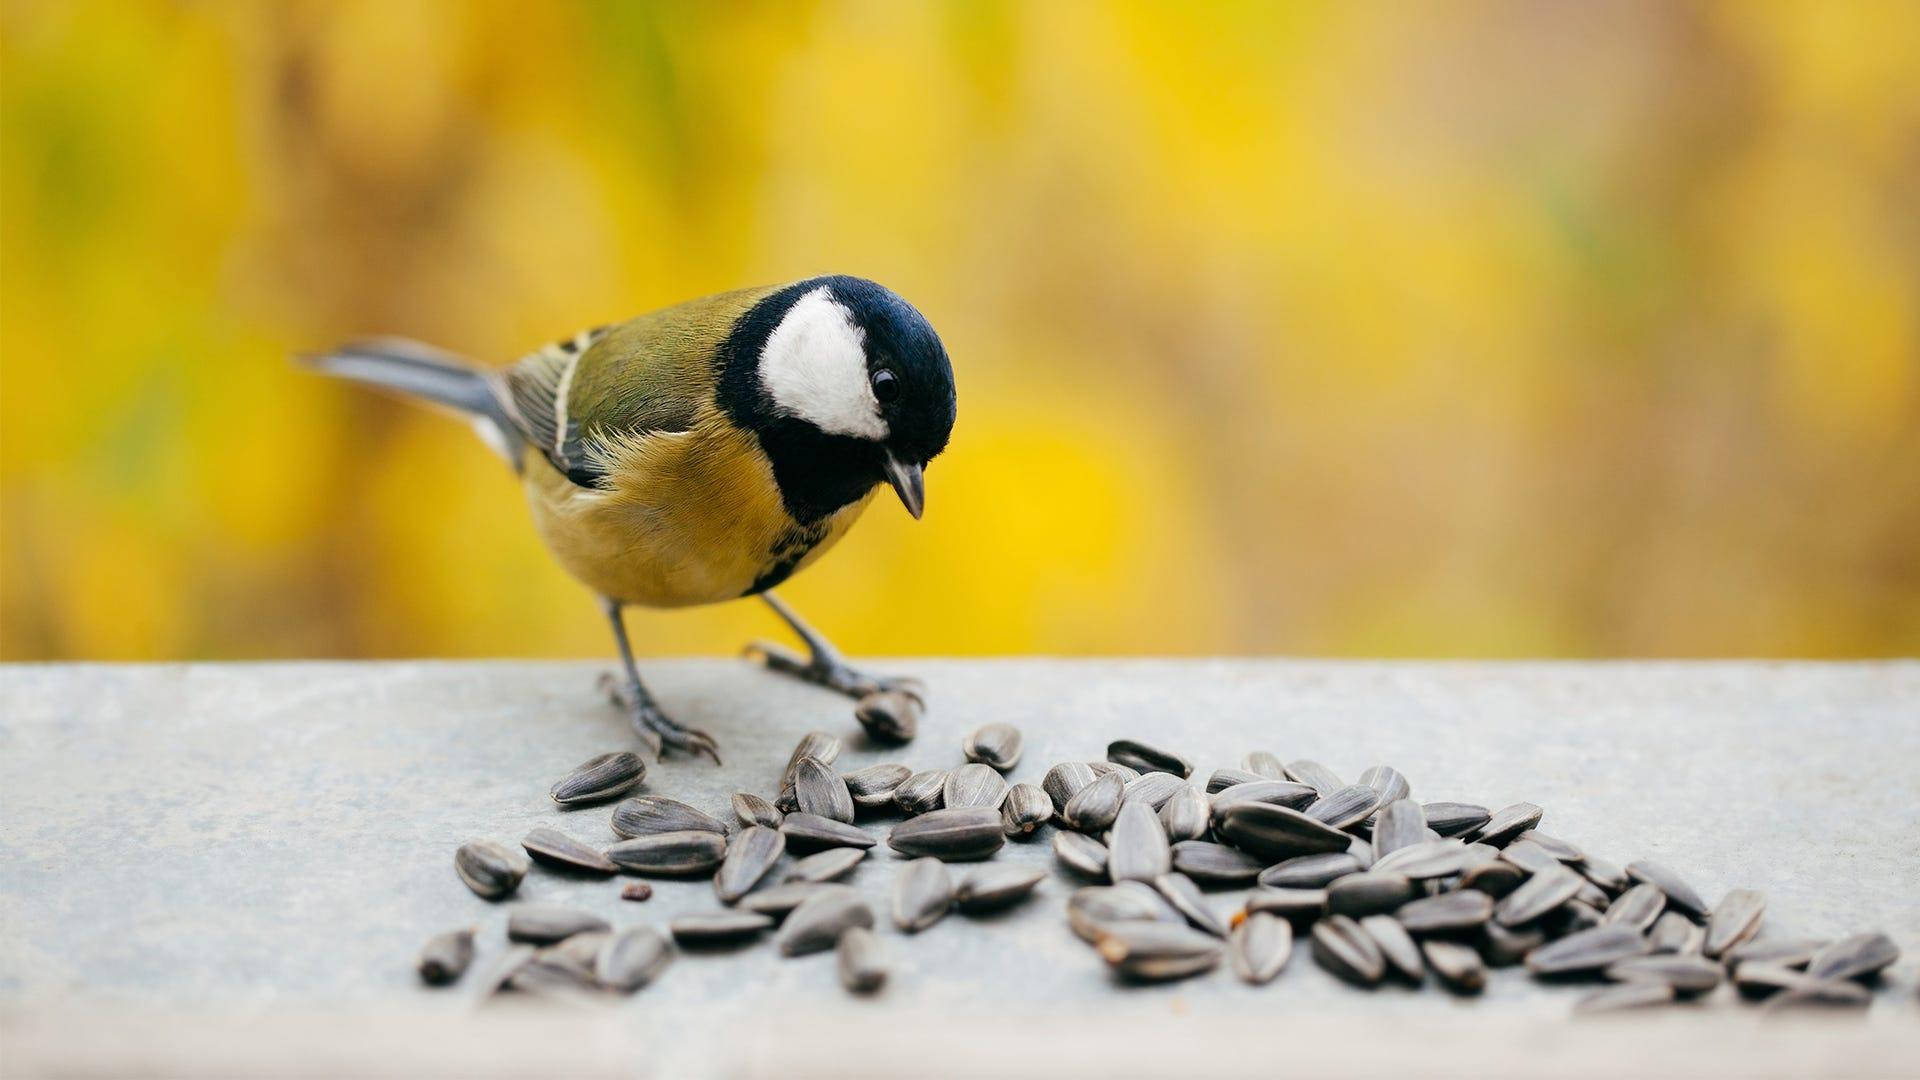 Busted! 5 Bird-Feeding Myths Put to Rest